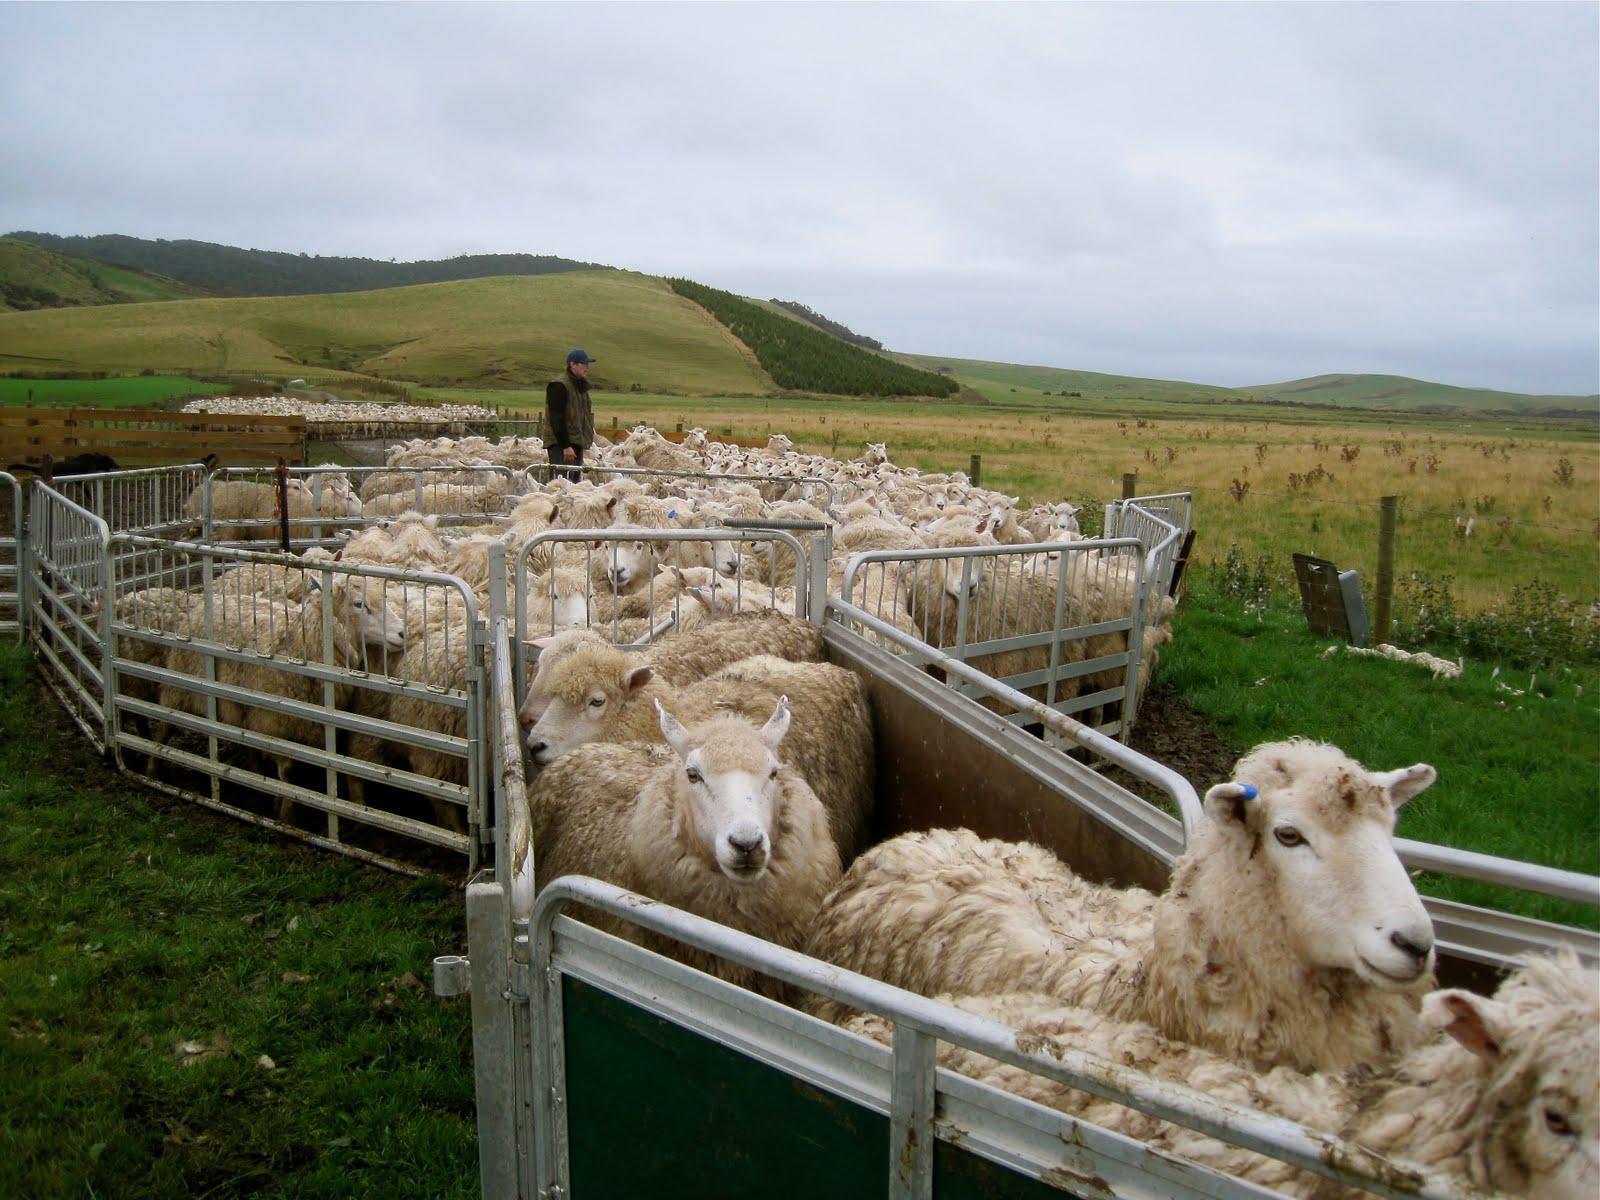 LAPAHIE.com 6.5 \\ Sheep corral east of Shiprock Pinnacle (Tsé Bit ...